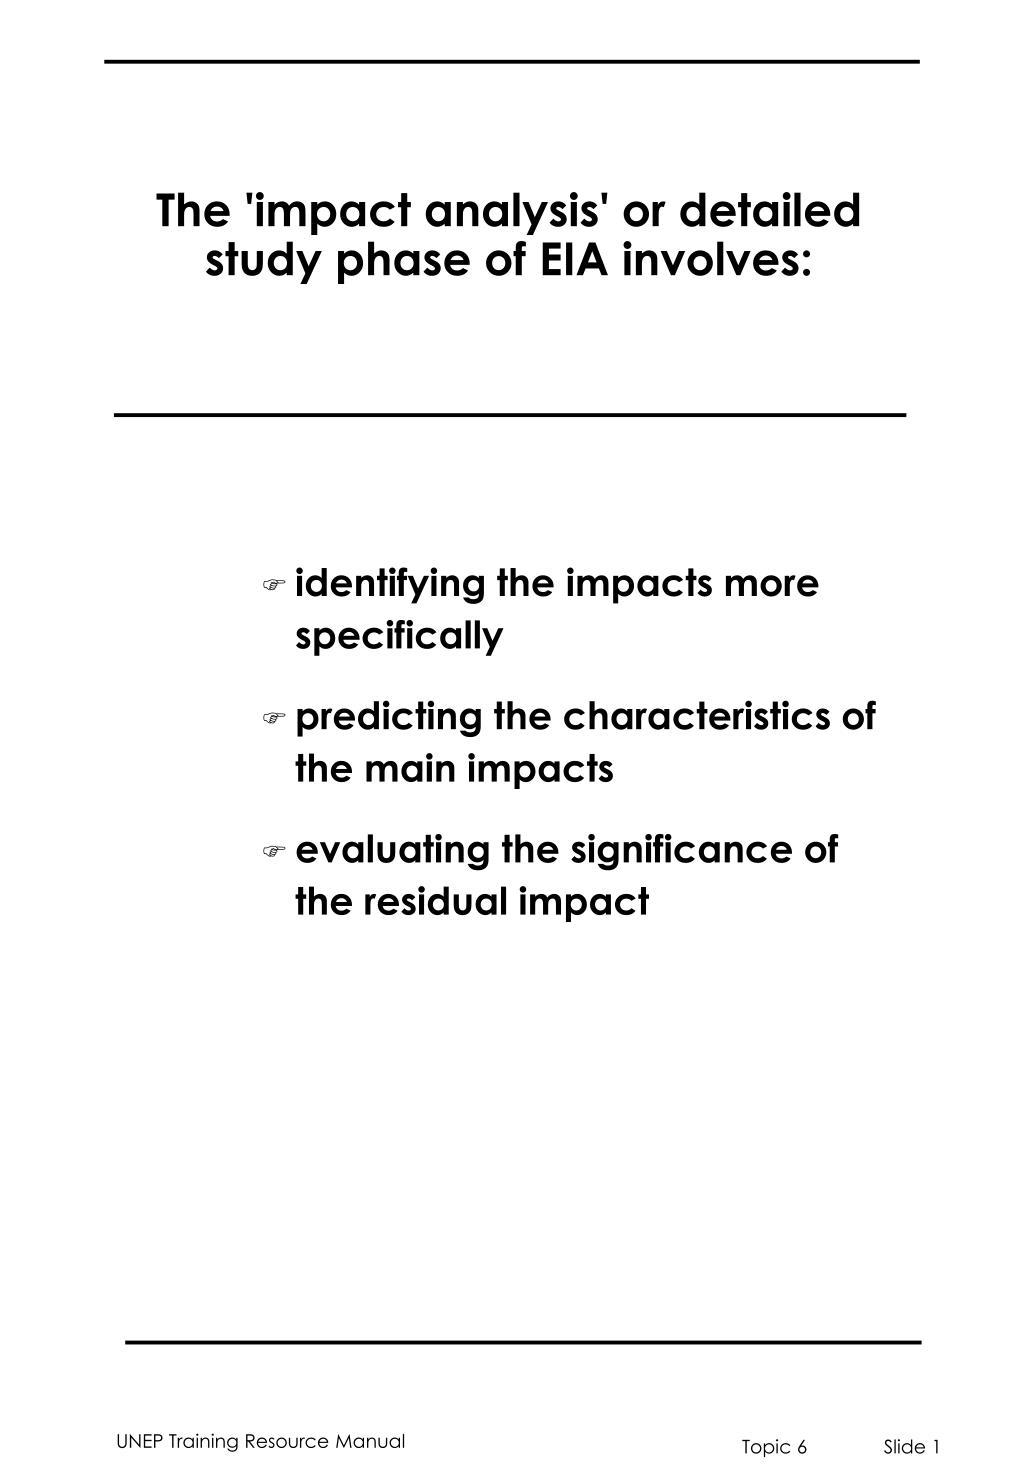 the impact analysis or detailed study phase of eia involves